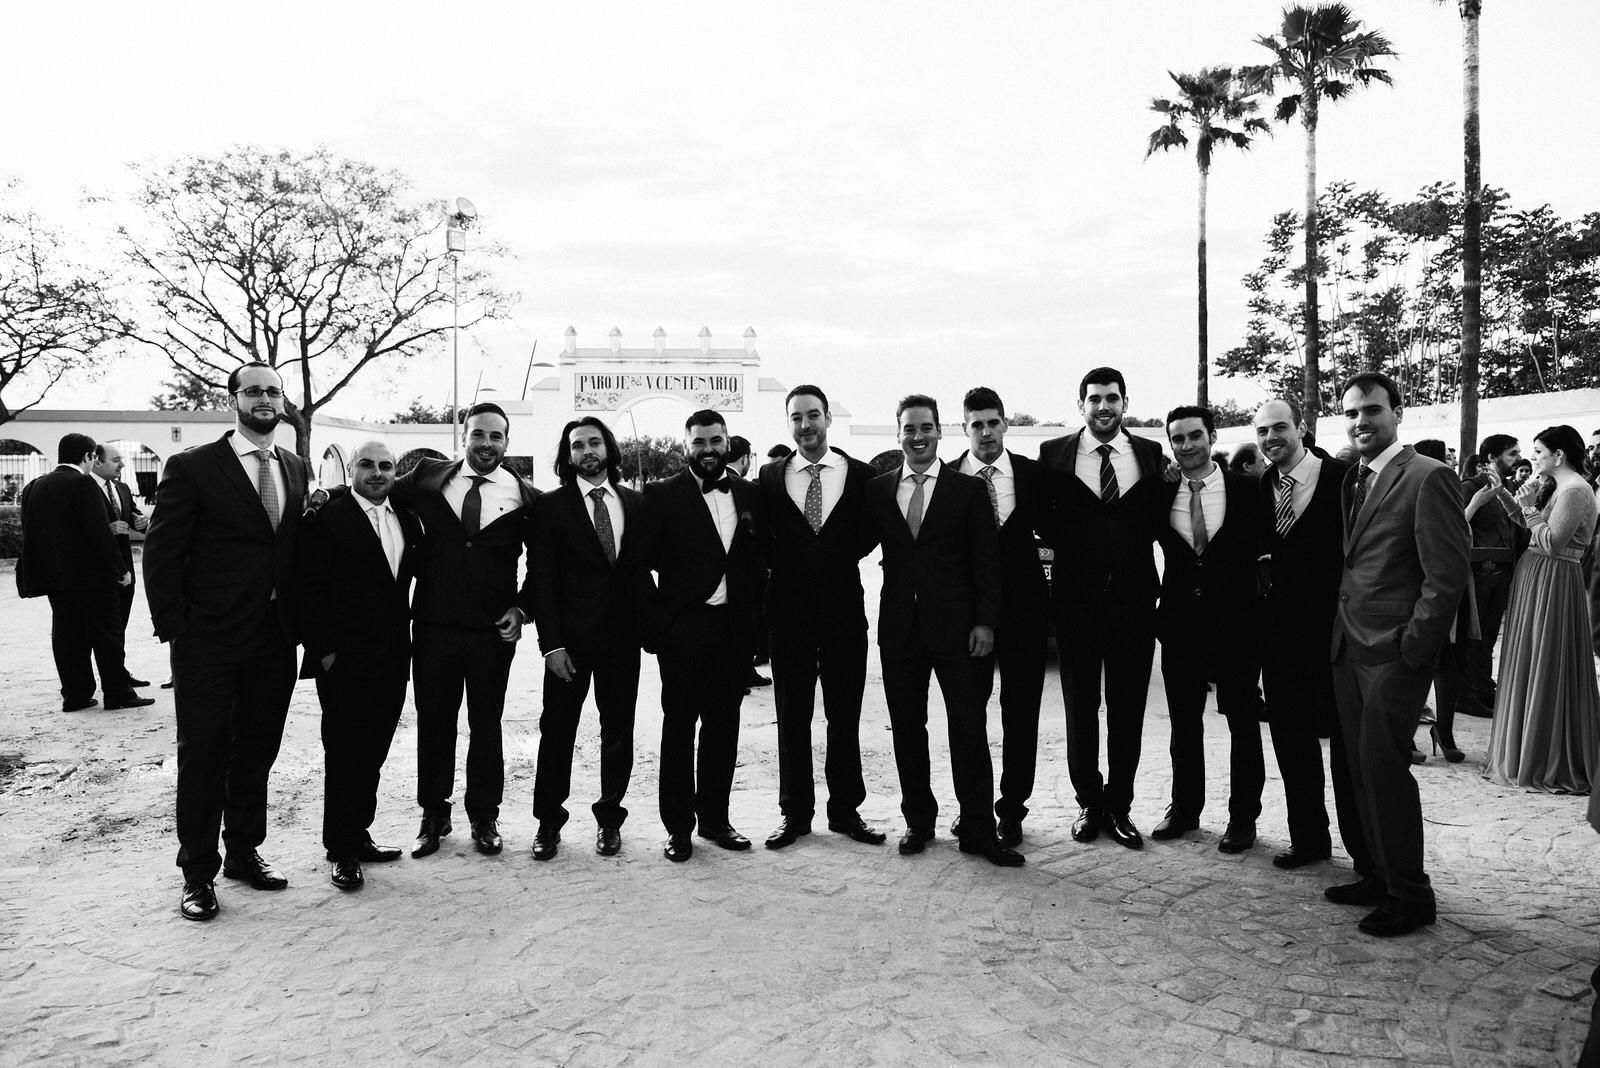 fotografo de bodas sevilla - fotografo boda - fotografía sevilla - Andrés AmarilloAAA_3247-2- fine.JPG